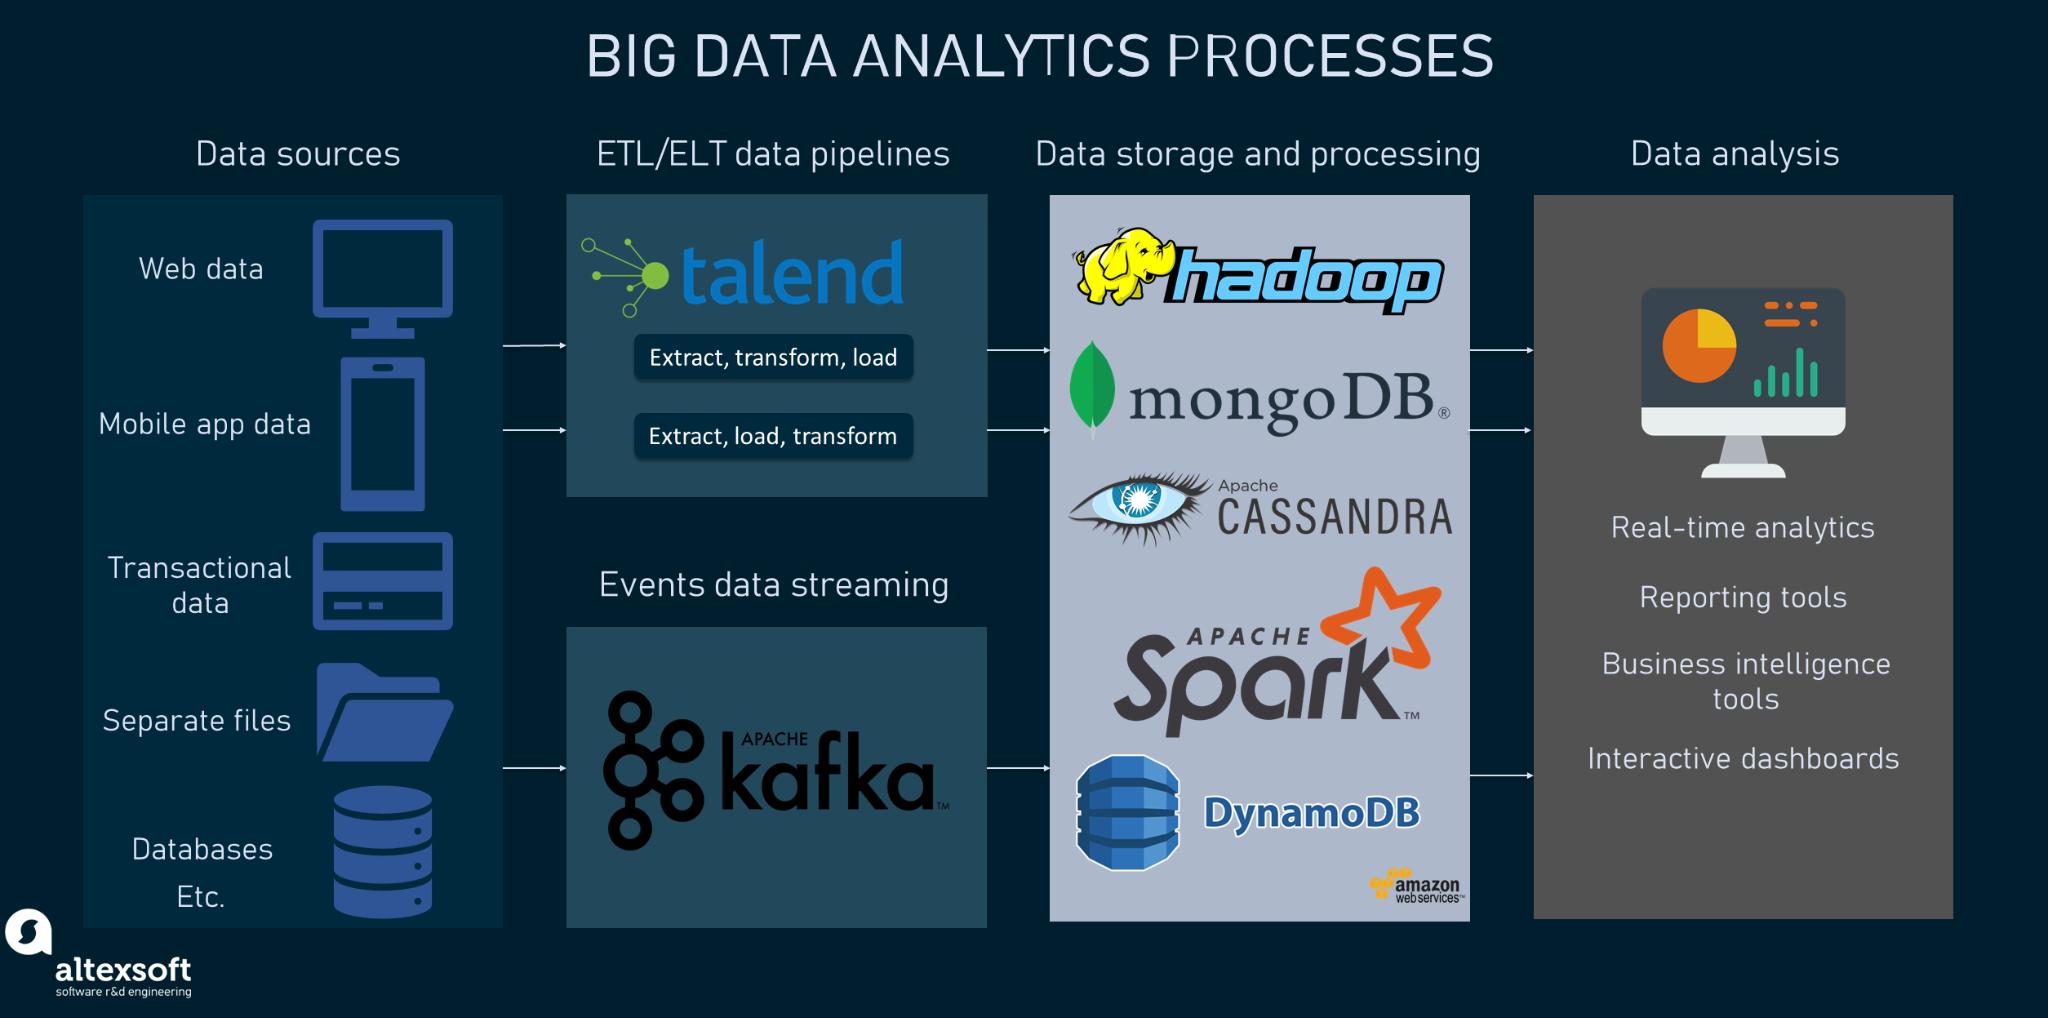 Big Data analytics processes and tools